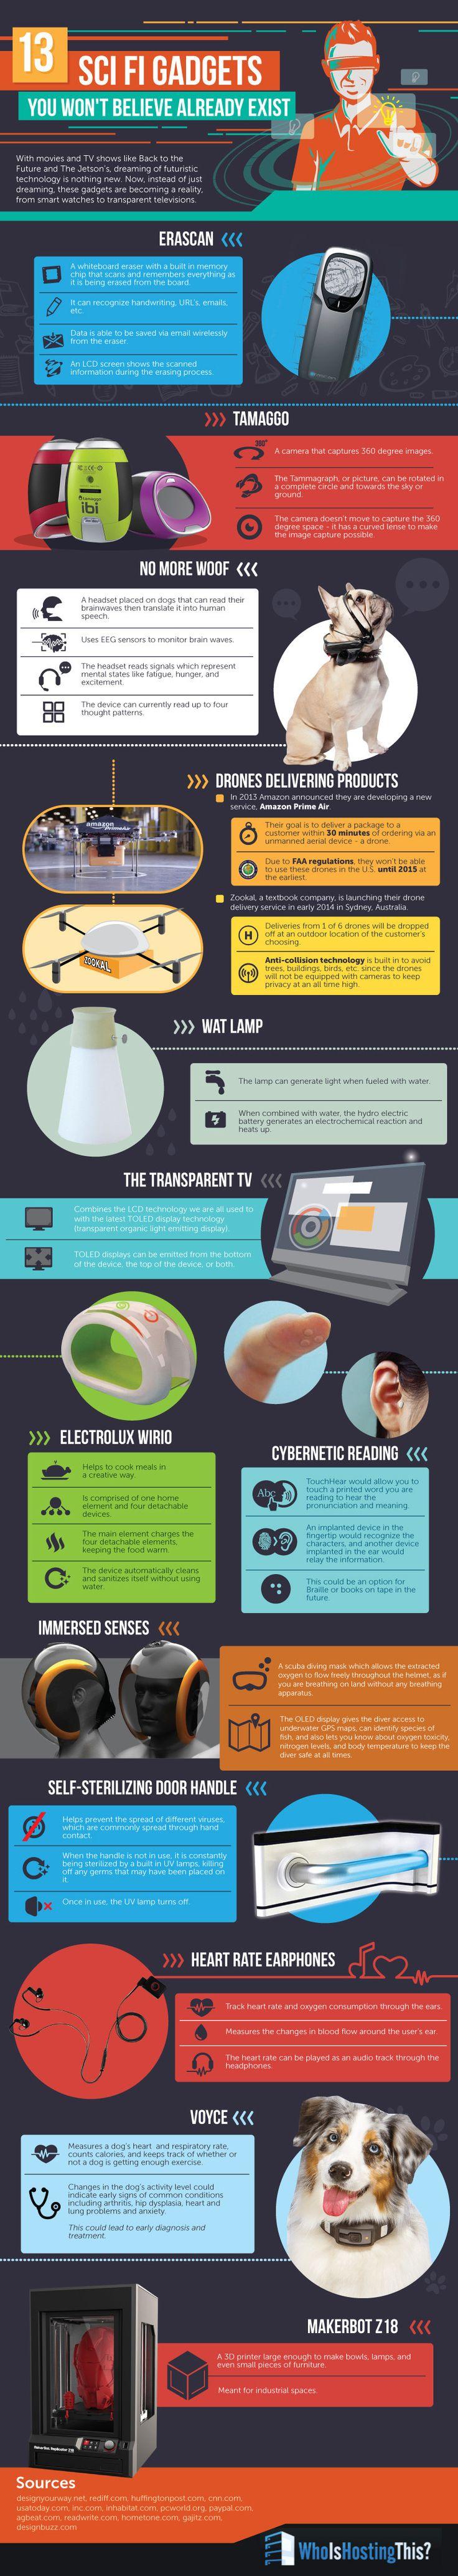 13 Sci-Fi Gadgets You Won't Believe Already Exist